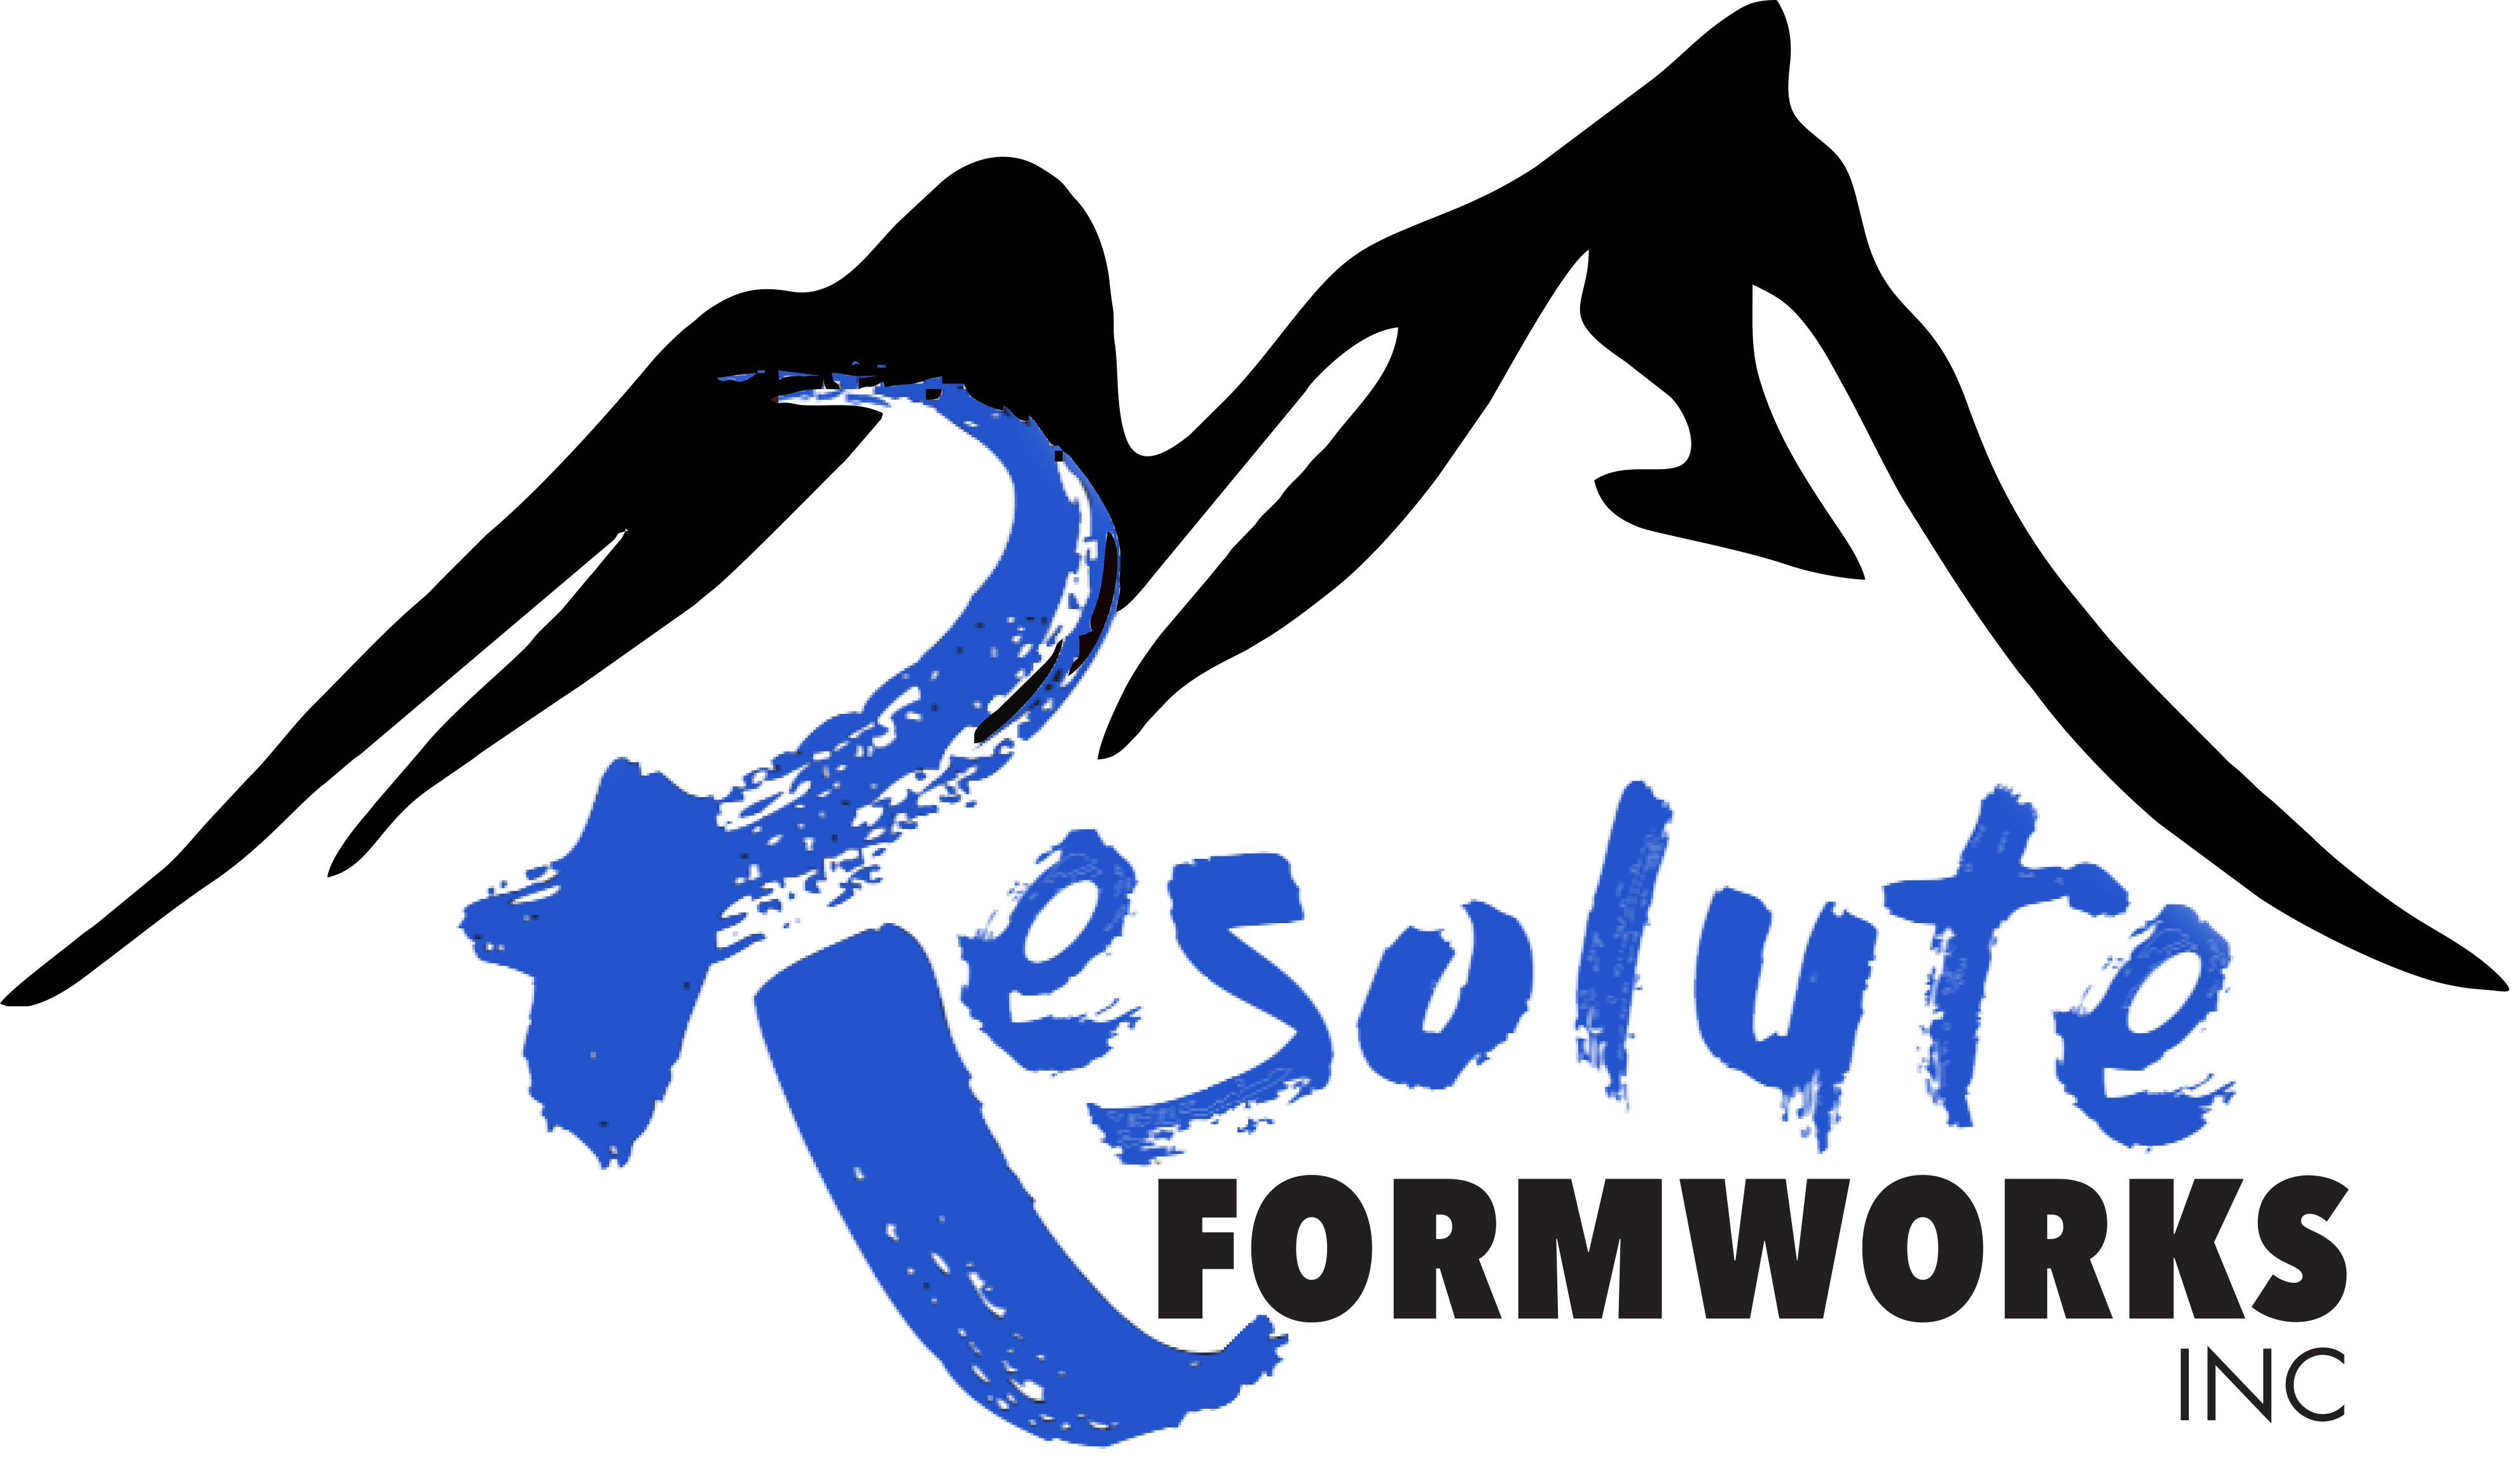 Resolute Formworks Inc logo